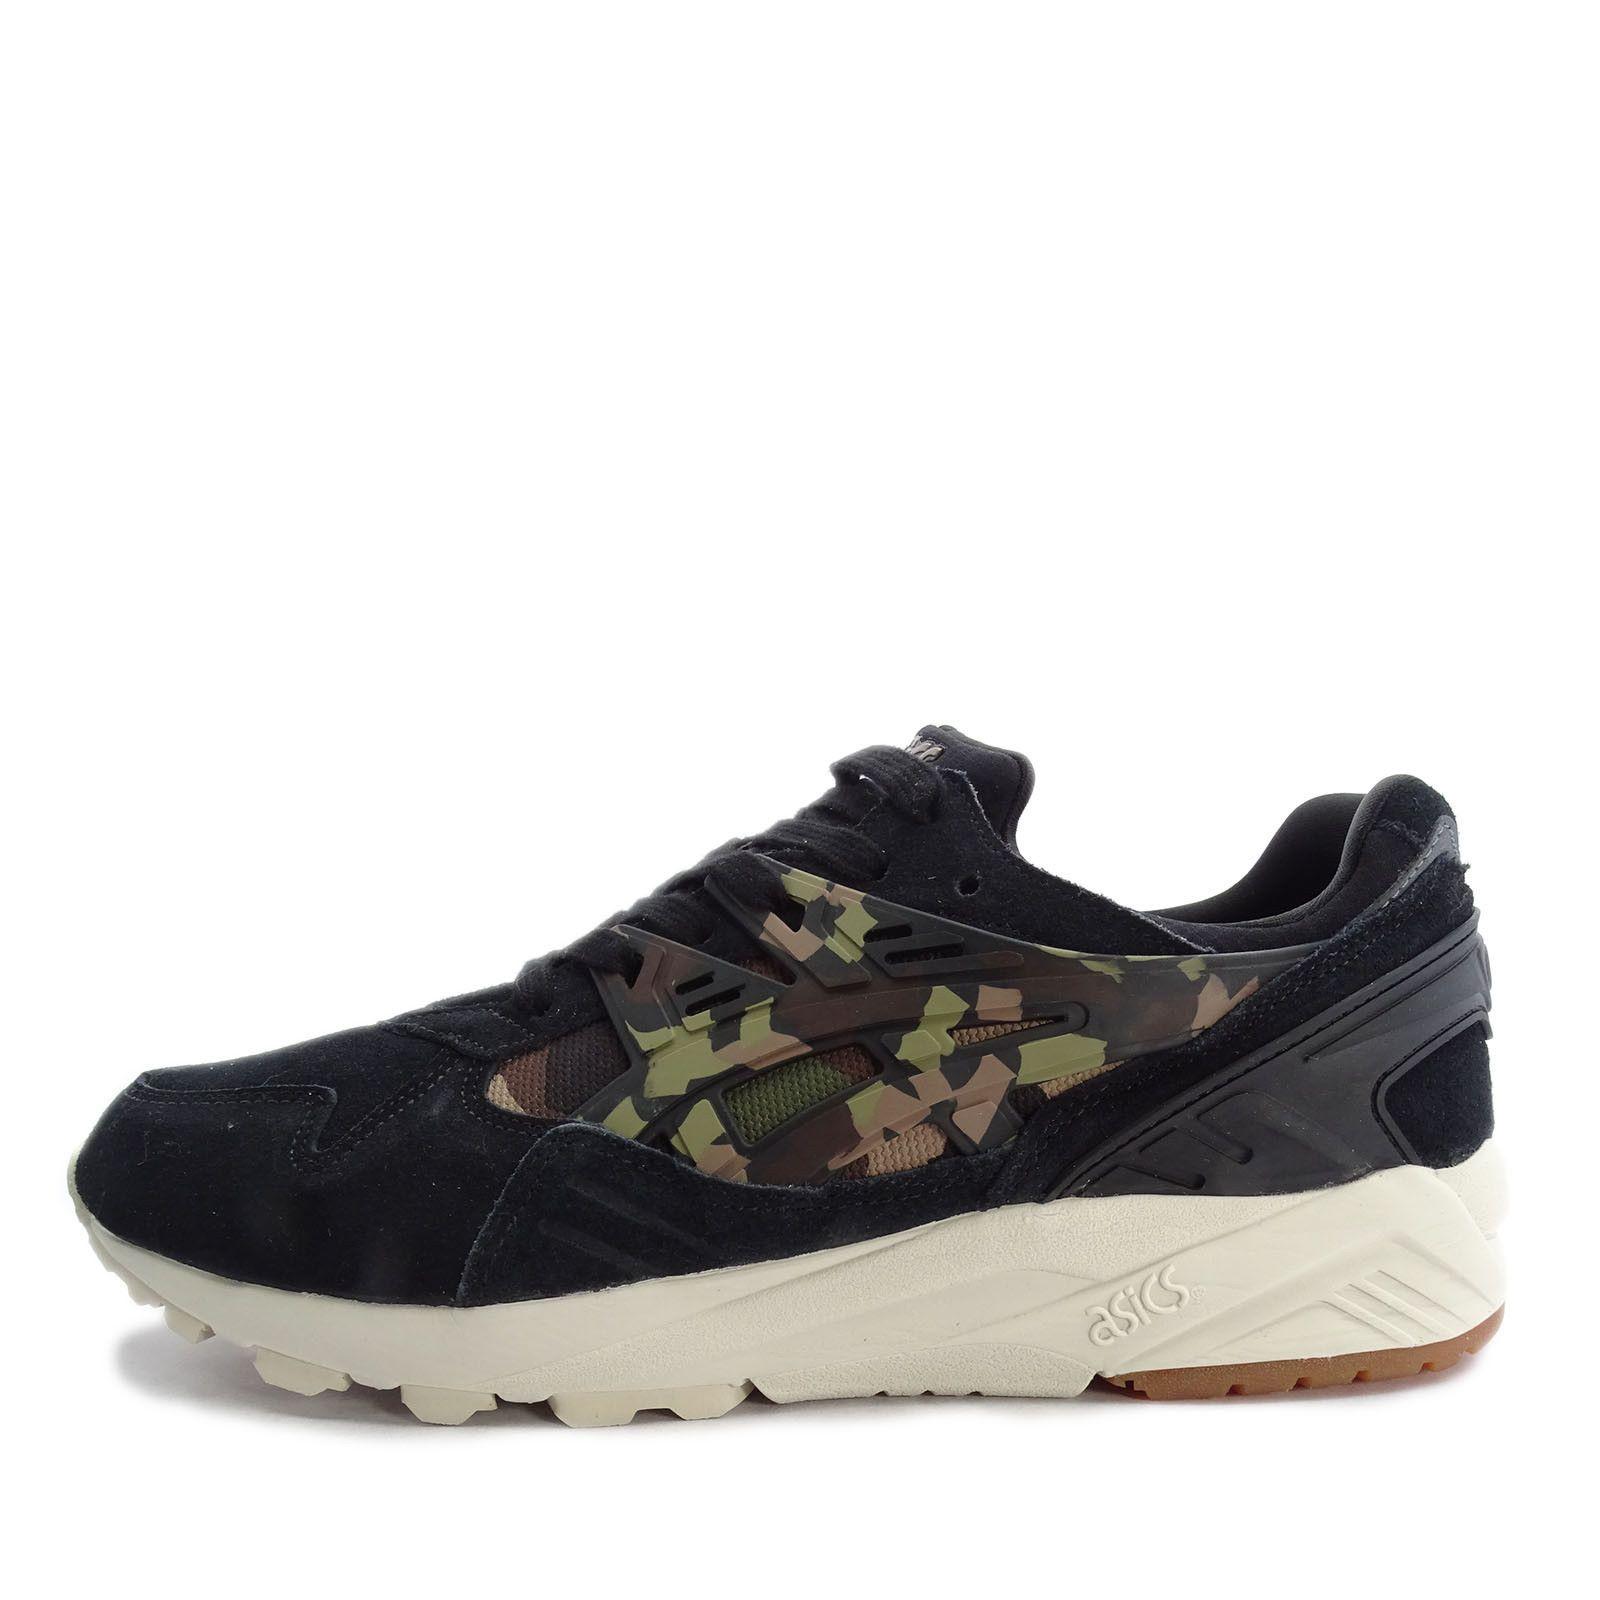 ASICS GEL KAYANO TRAINER Shoes Black Martini Olive Forest Camo SZ ( HL7C1 9086 )